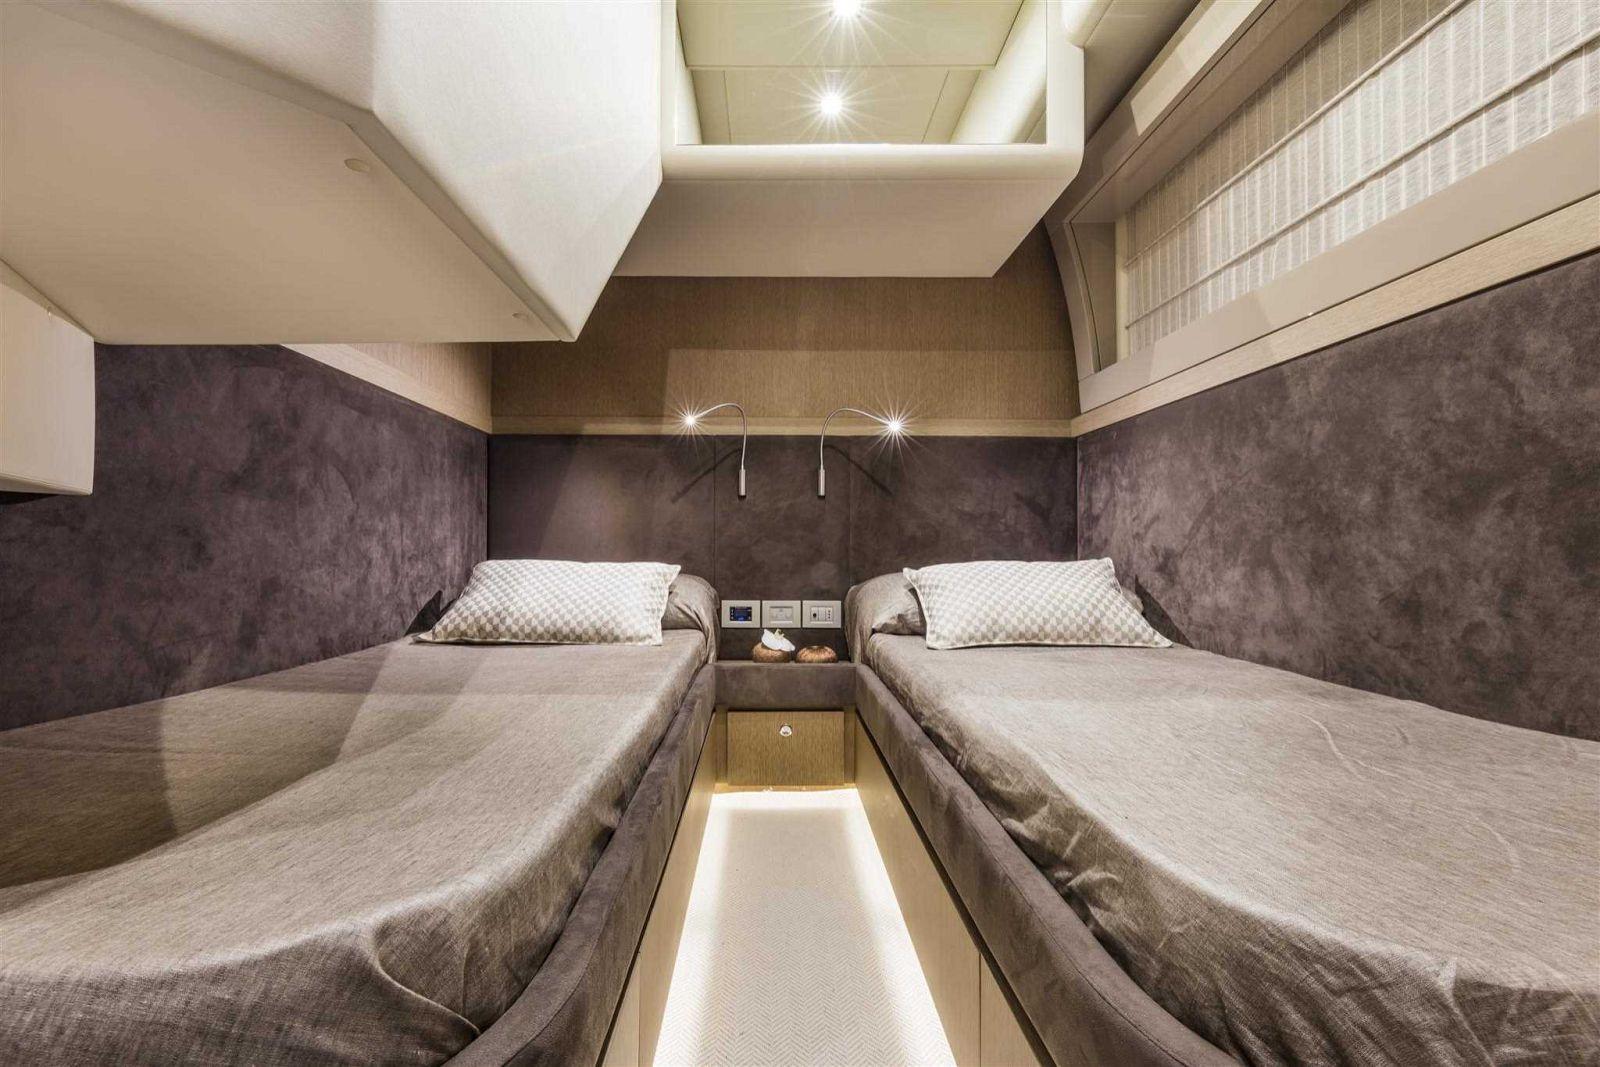 Ferretti Yachts 700 Cabin - New Luxury Yacht for Sale >